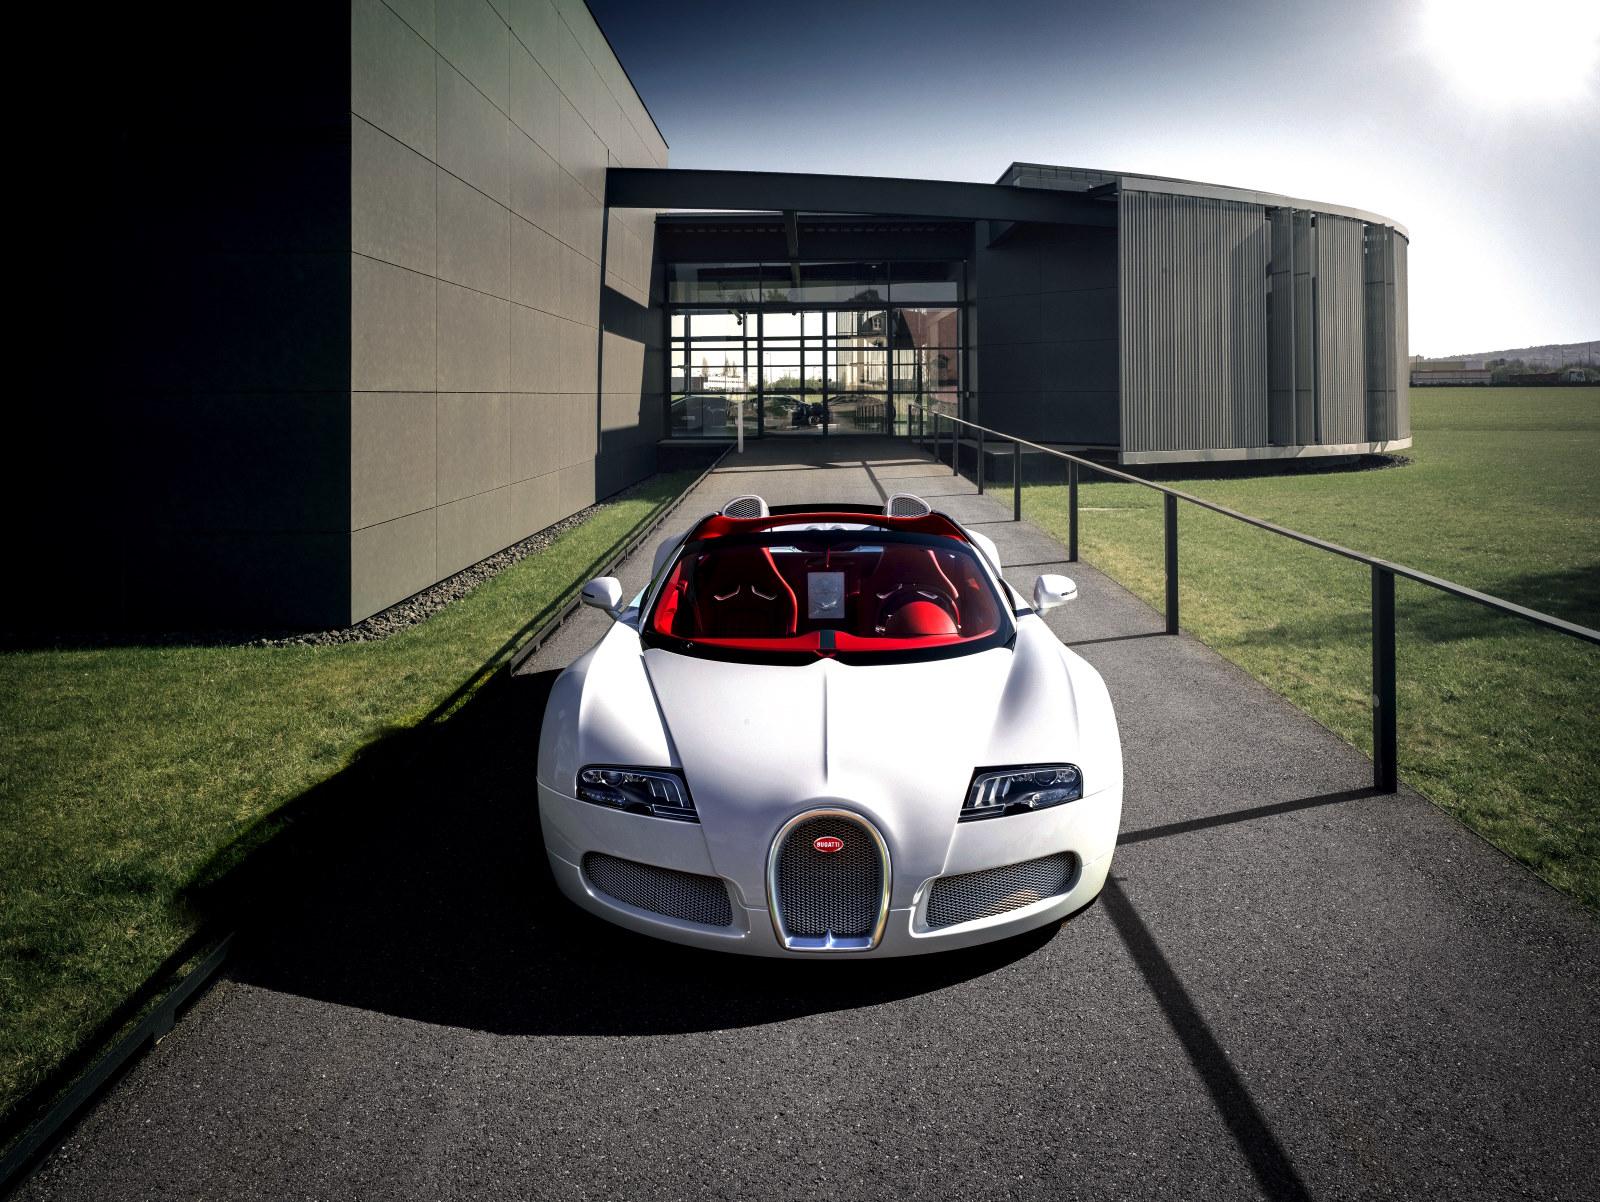 grand-sport-weilong00-1335290324 Remarkable Bugatti Veyron Grand Sport Vitesse Informacion Cars Trend